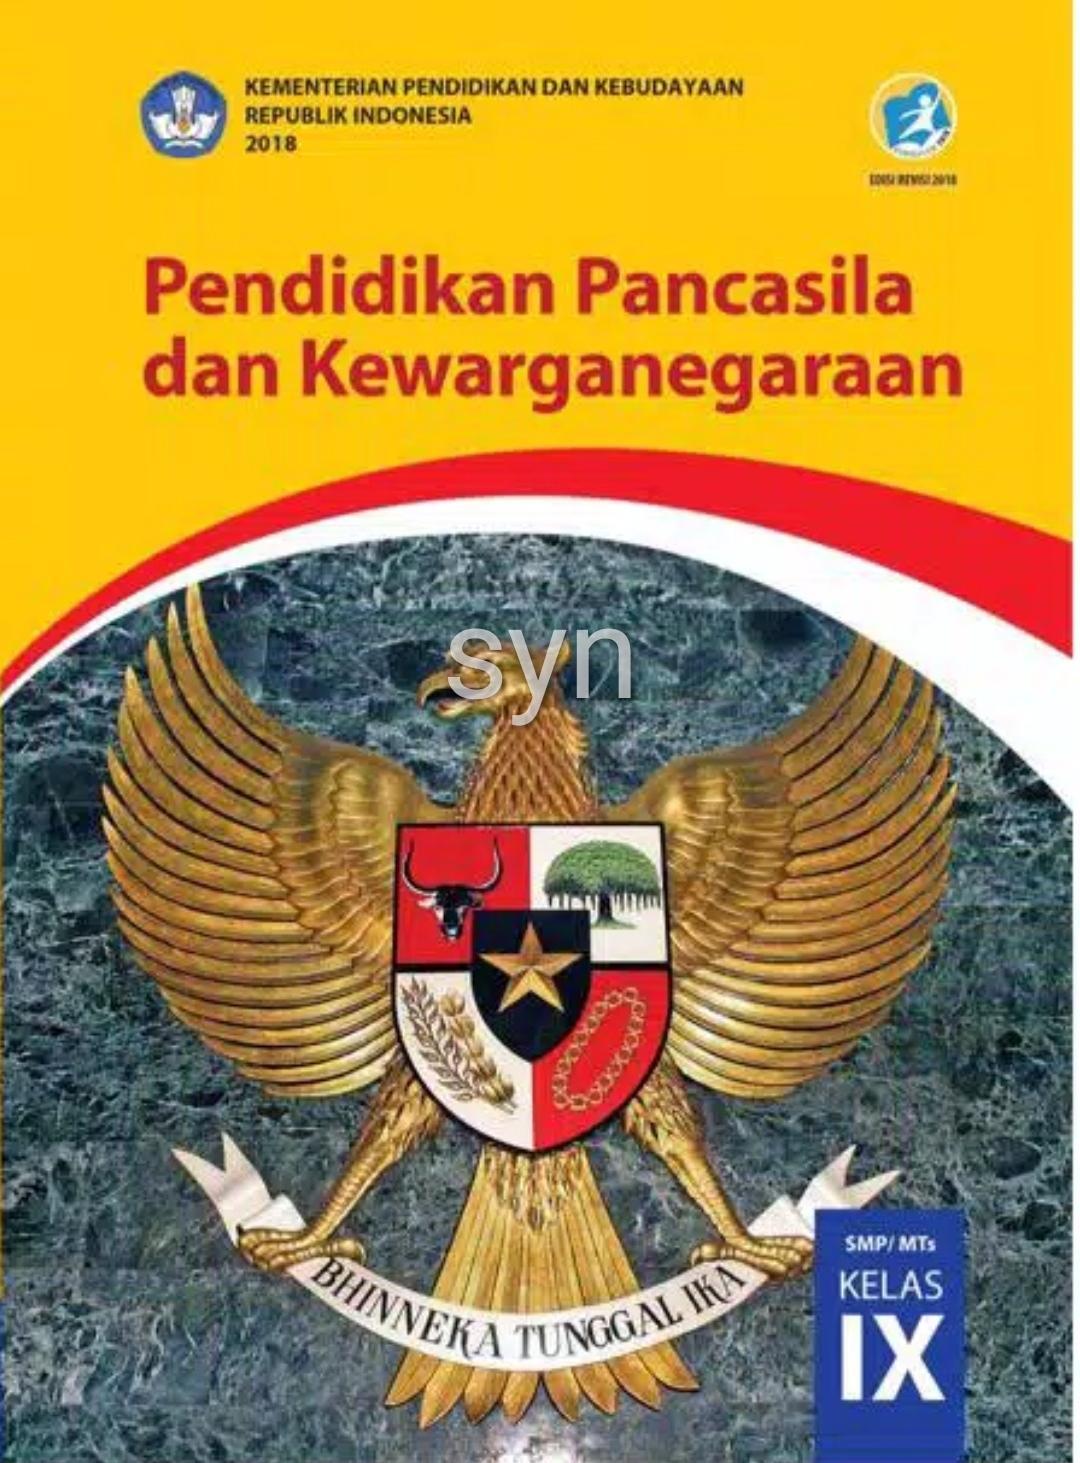 Ppkn Kelas 9 Buku Pelajaran Pkn Kelas Sembilan Buku Paket Pkn Smp Kelas 9 Kurikulum 2013 Revisi 2018 Lazada Indonesia